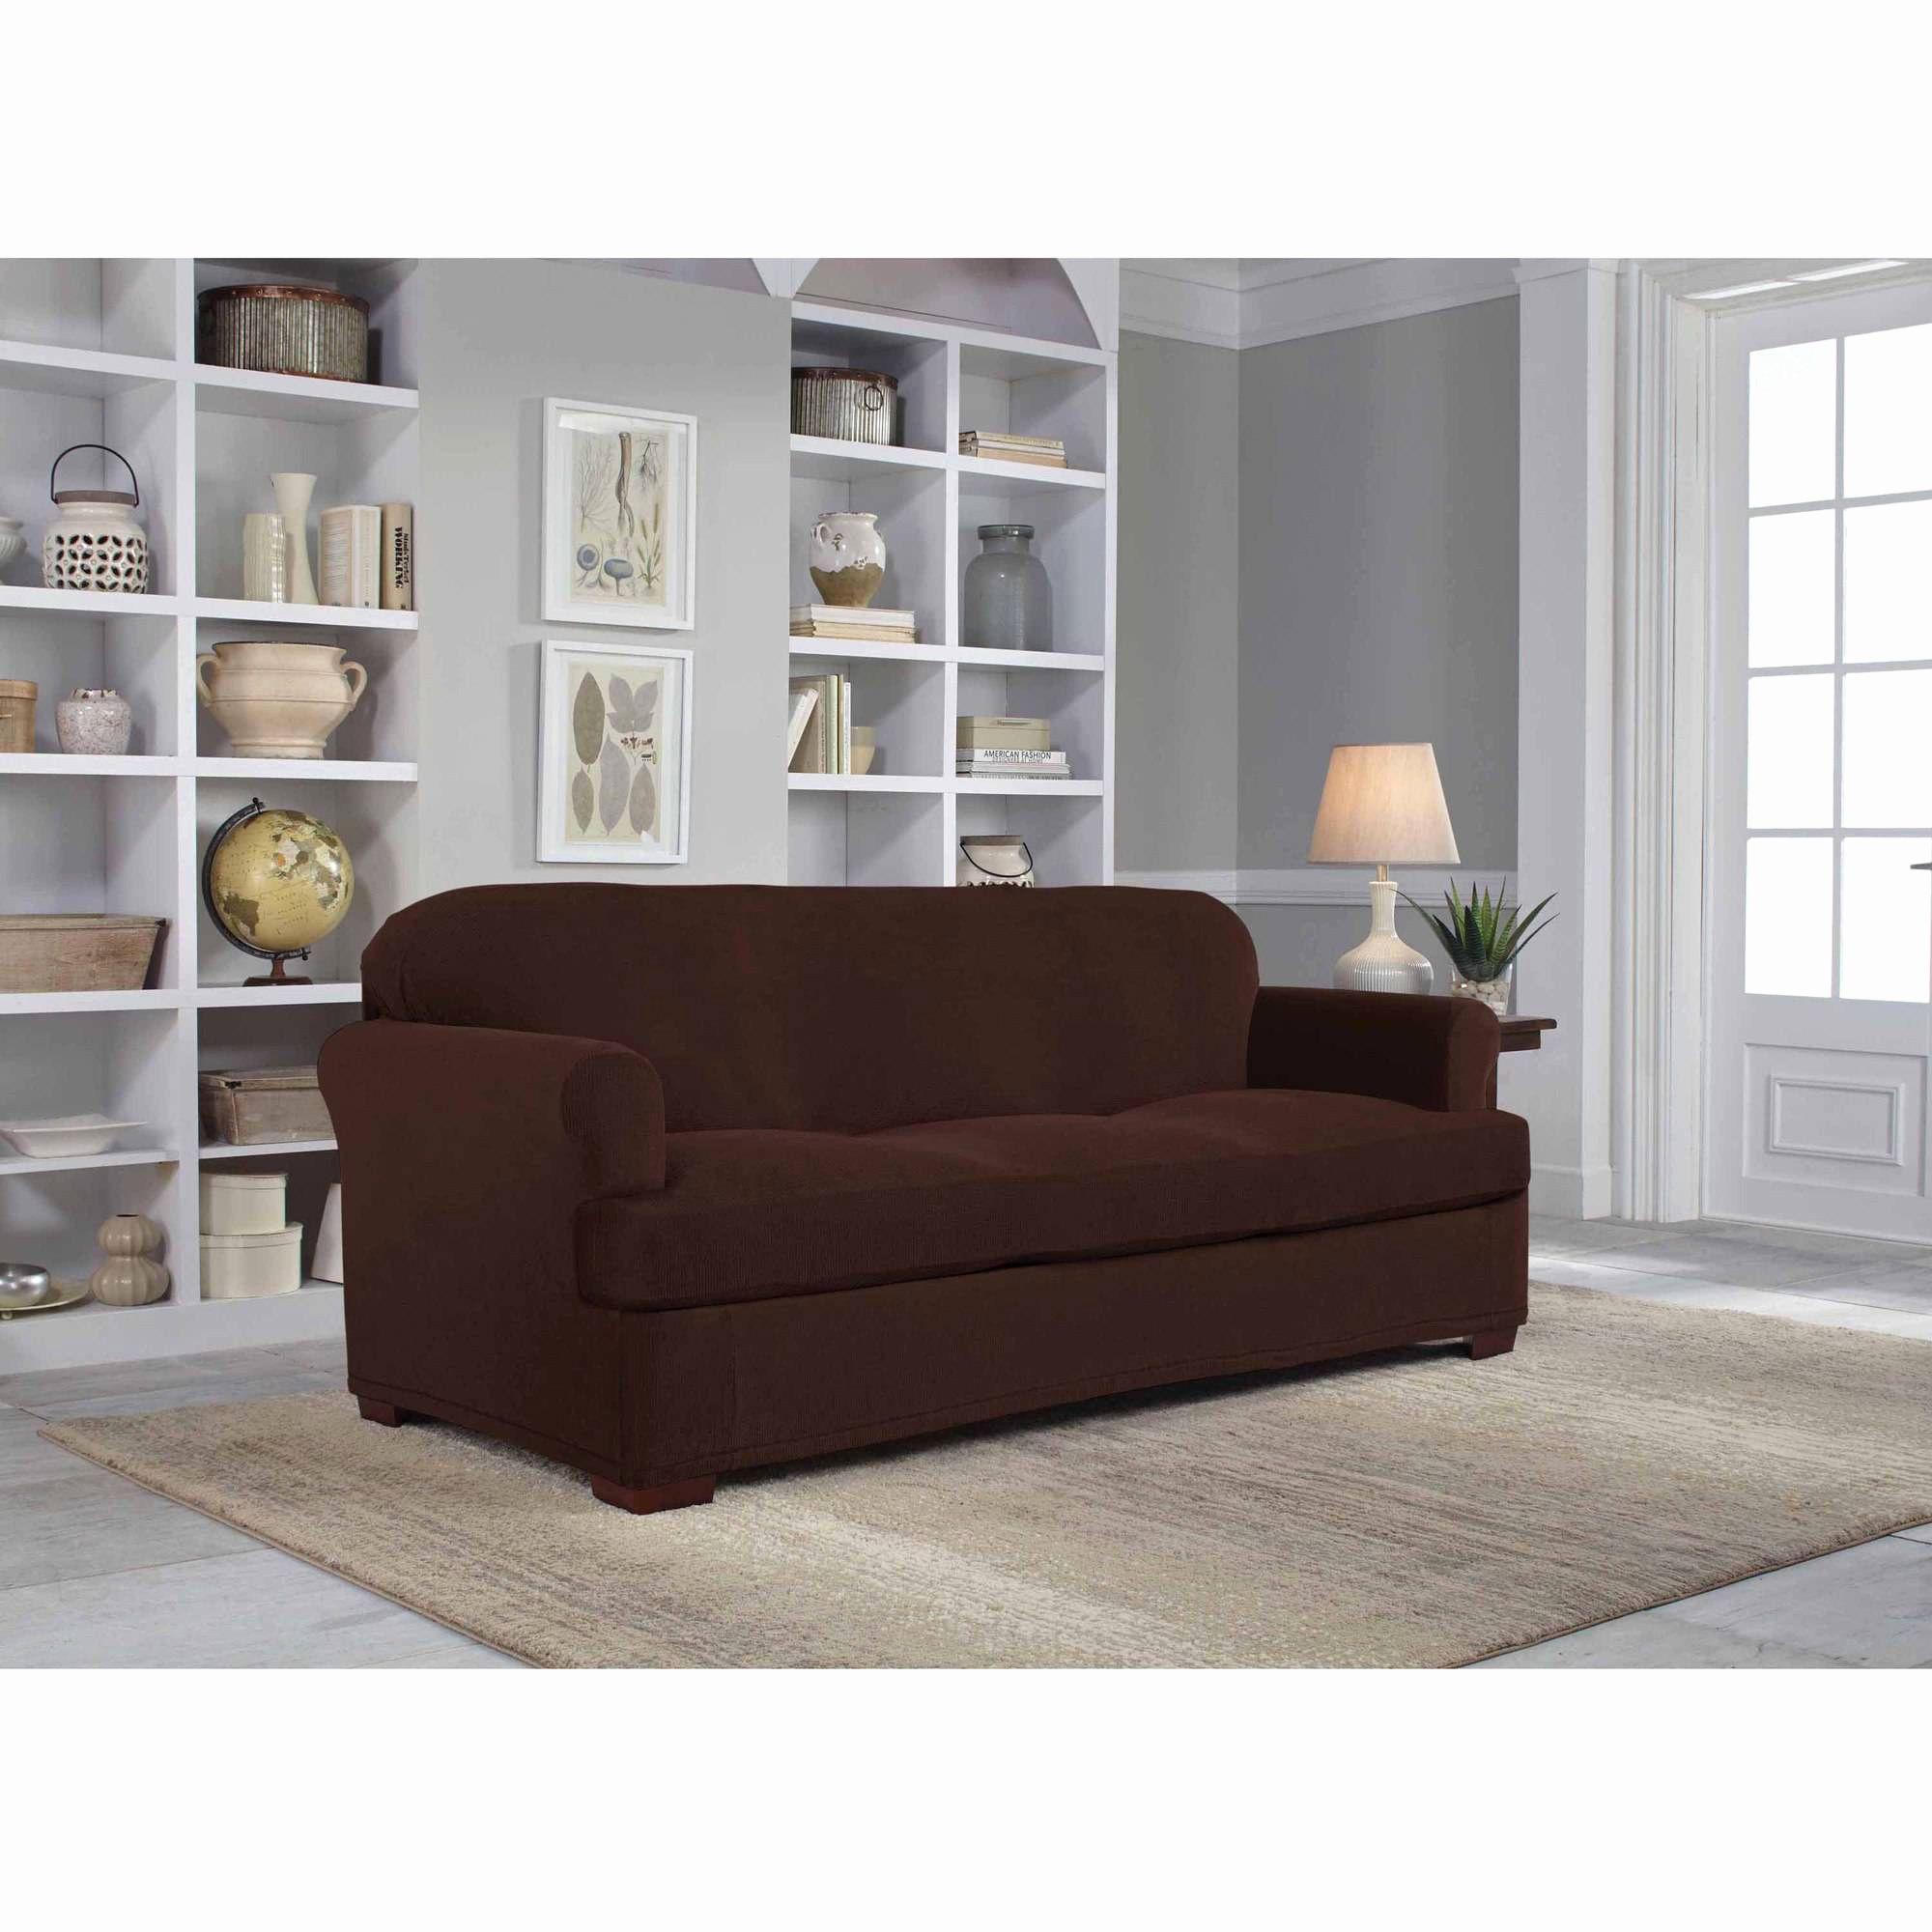 Inspirational Gray Sofa Cover Image Serta Stretch Grid Slipcover Sofa 2 Piece  T Cushion Walmart